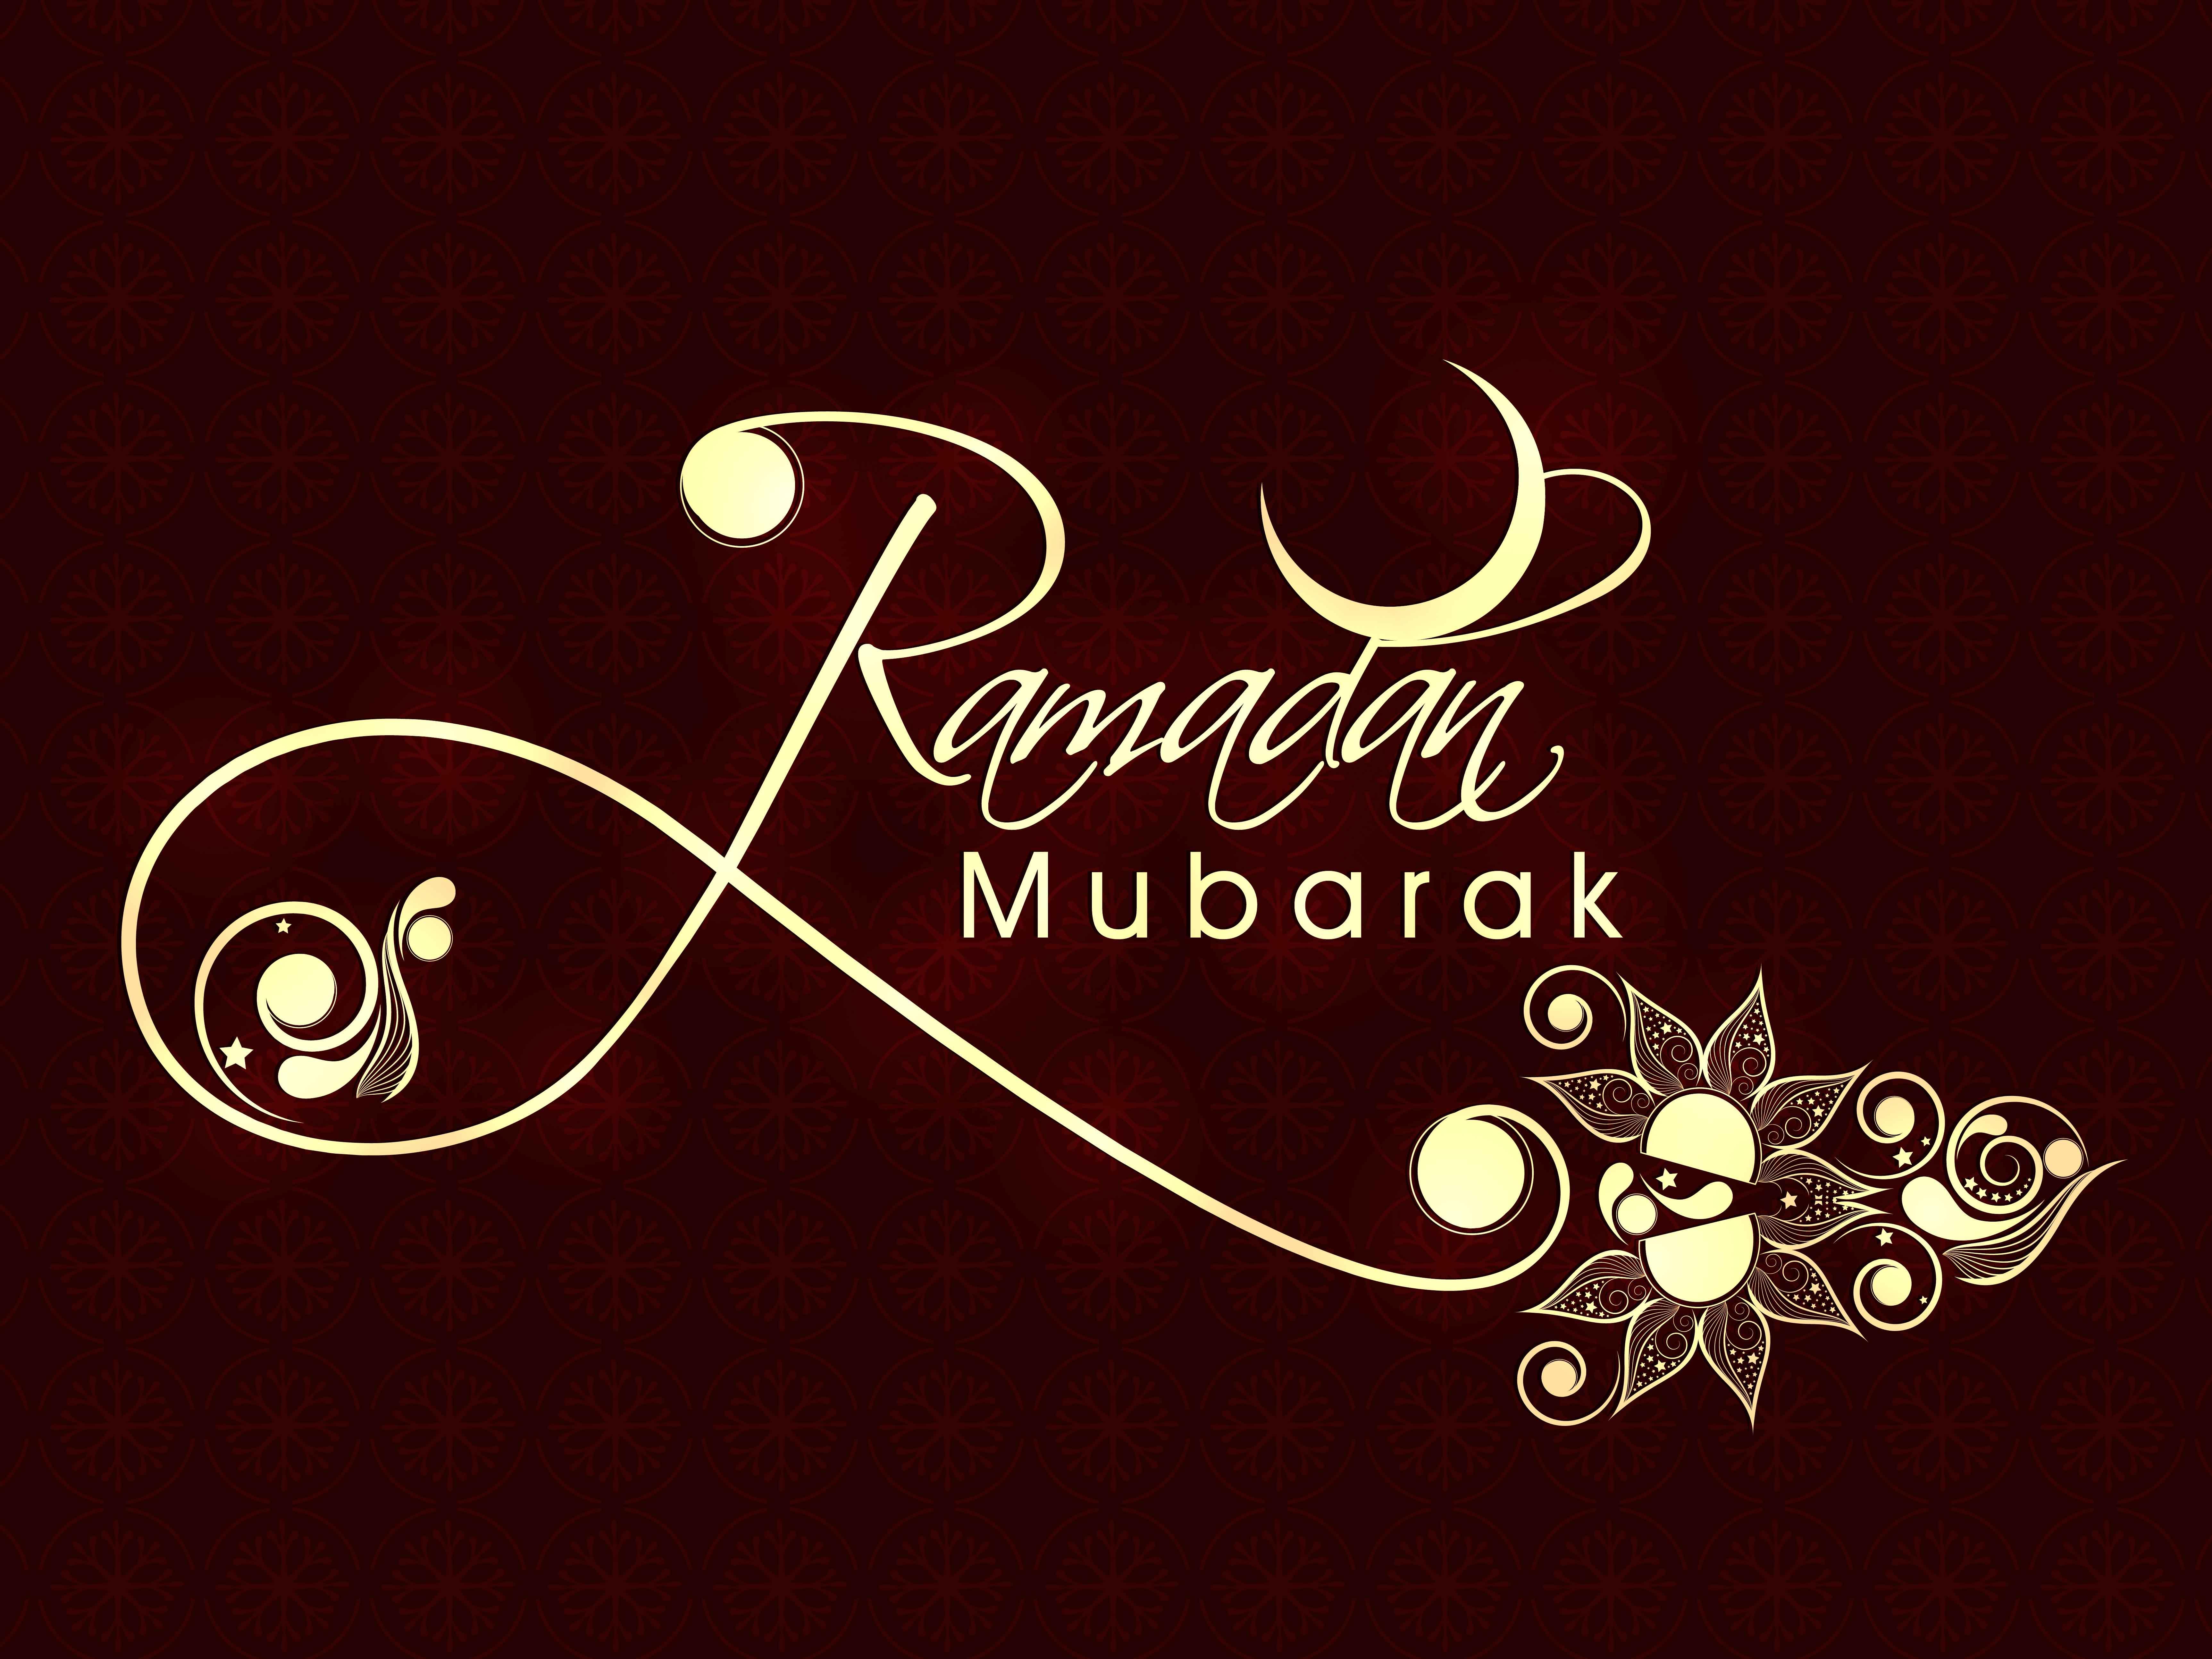 Ramadan Wallpaper Hd Posted By Christopher Mercado